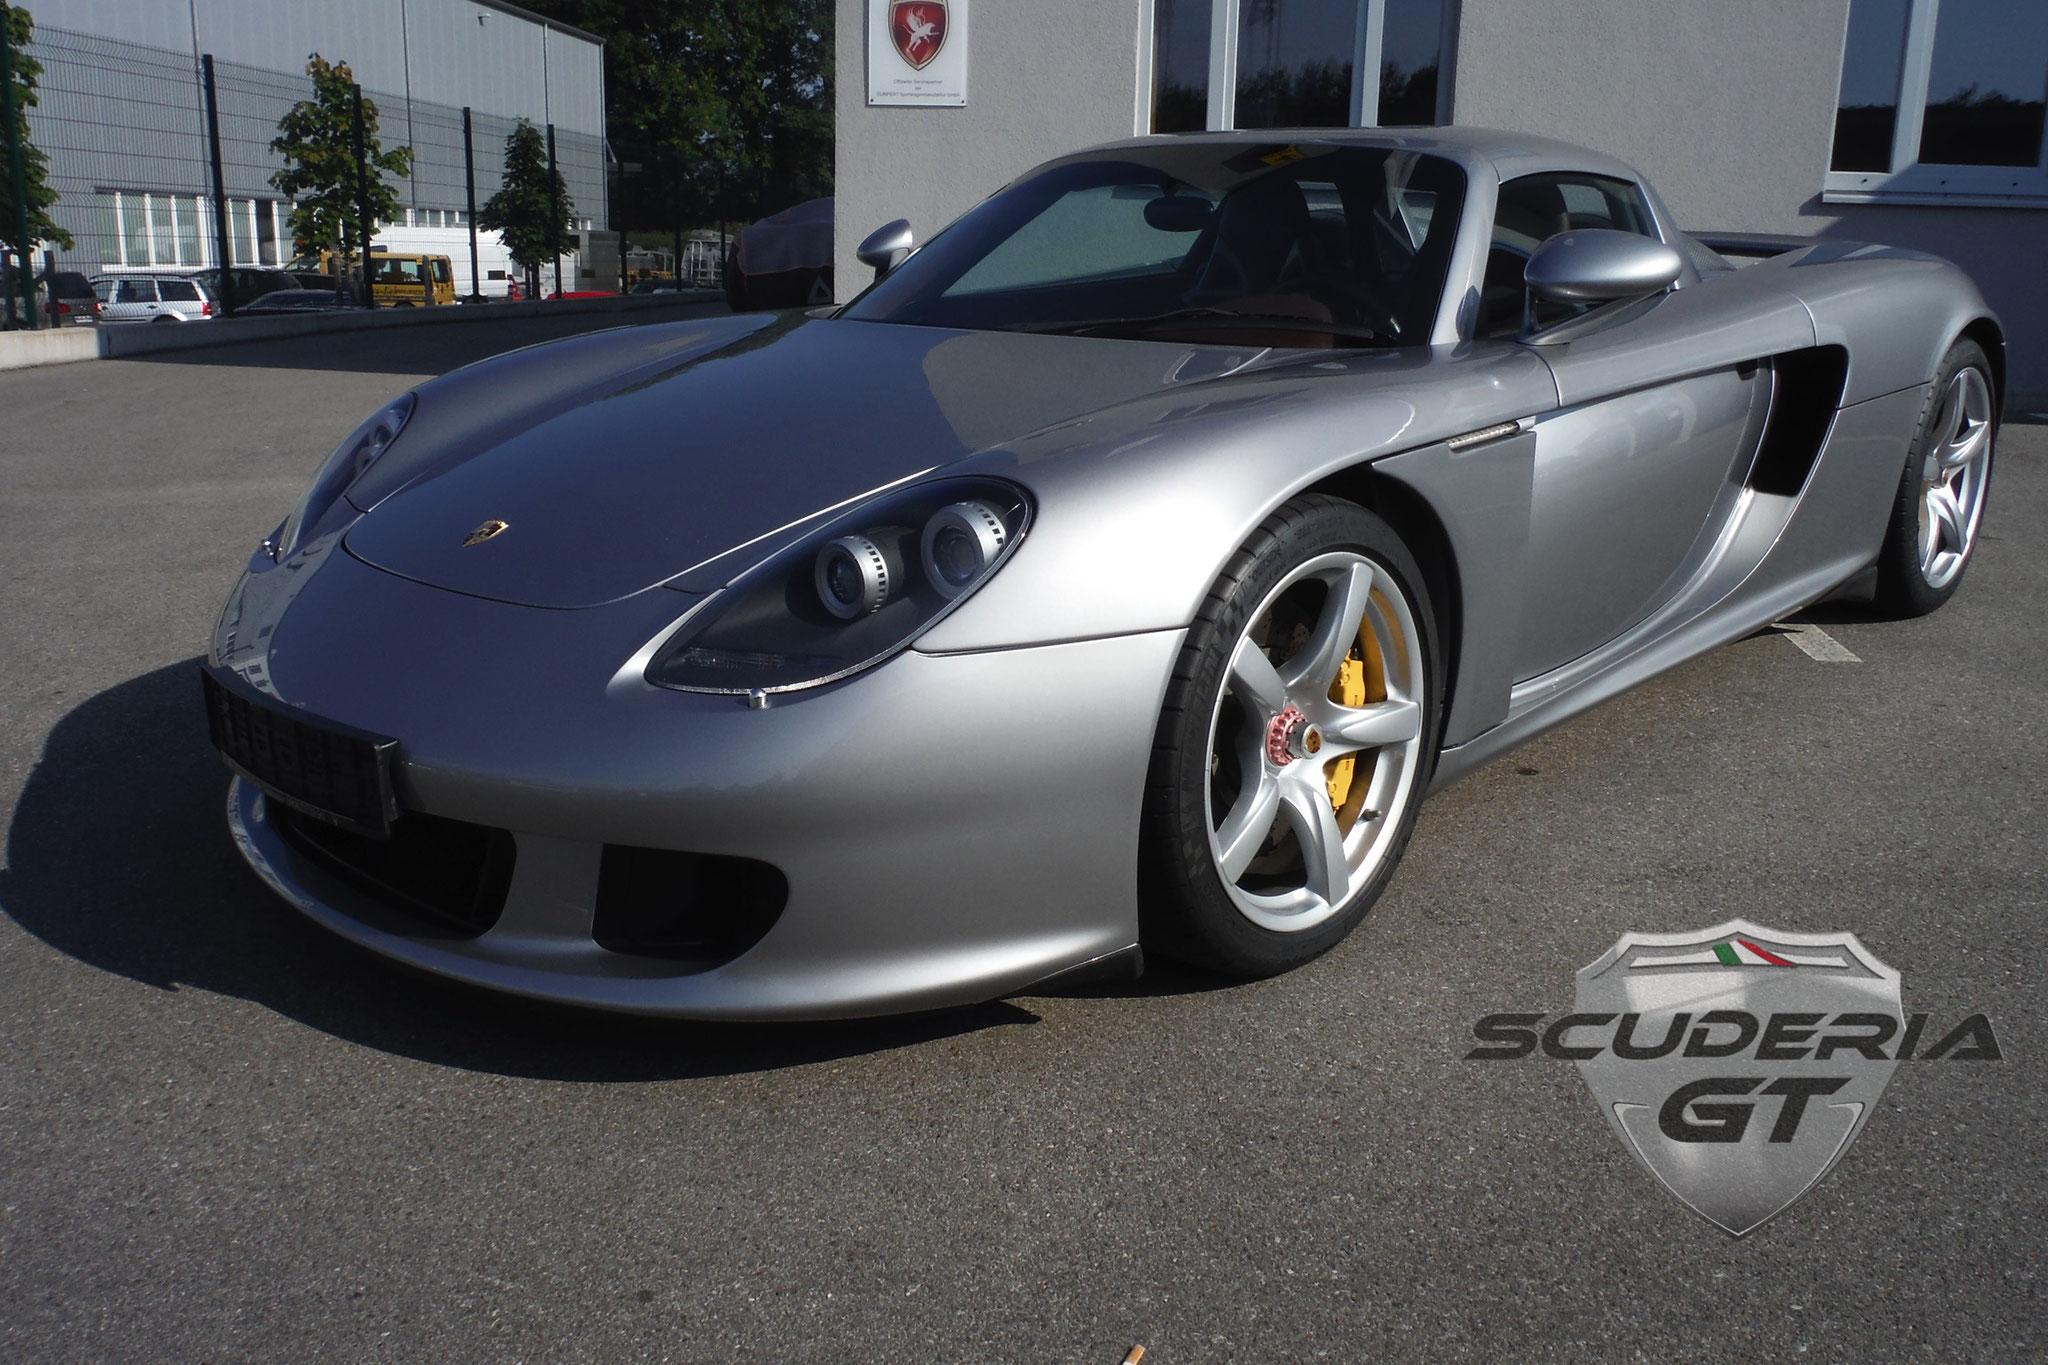 Porsche Carrera GT (SOLD)